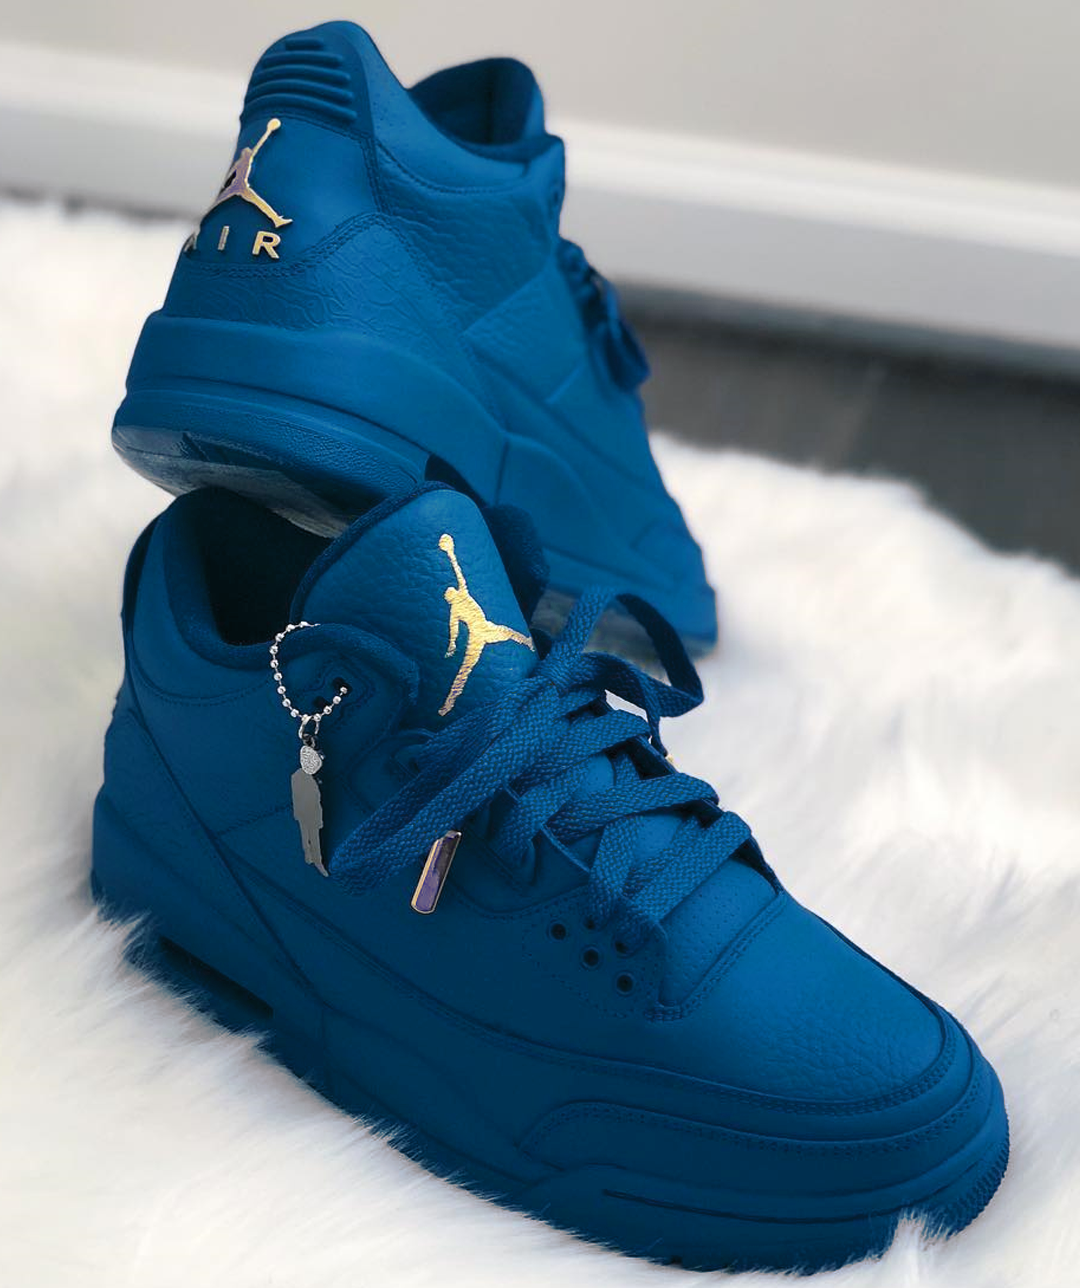 info for e7907 02b70 Air Jordan 3s   Air Jordan 23 in 2019   Shoes, Sneaker boots, Blue ...